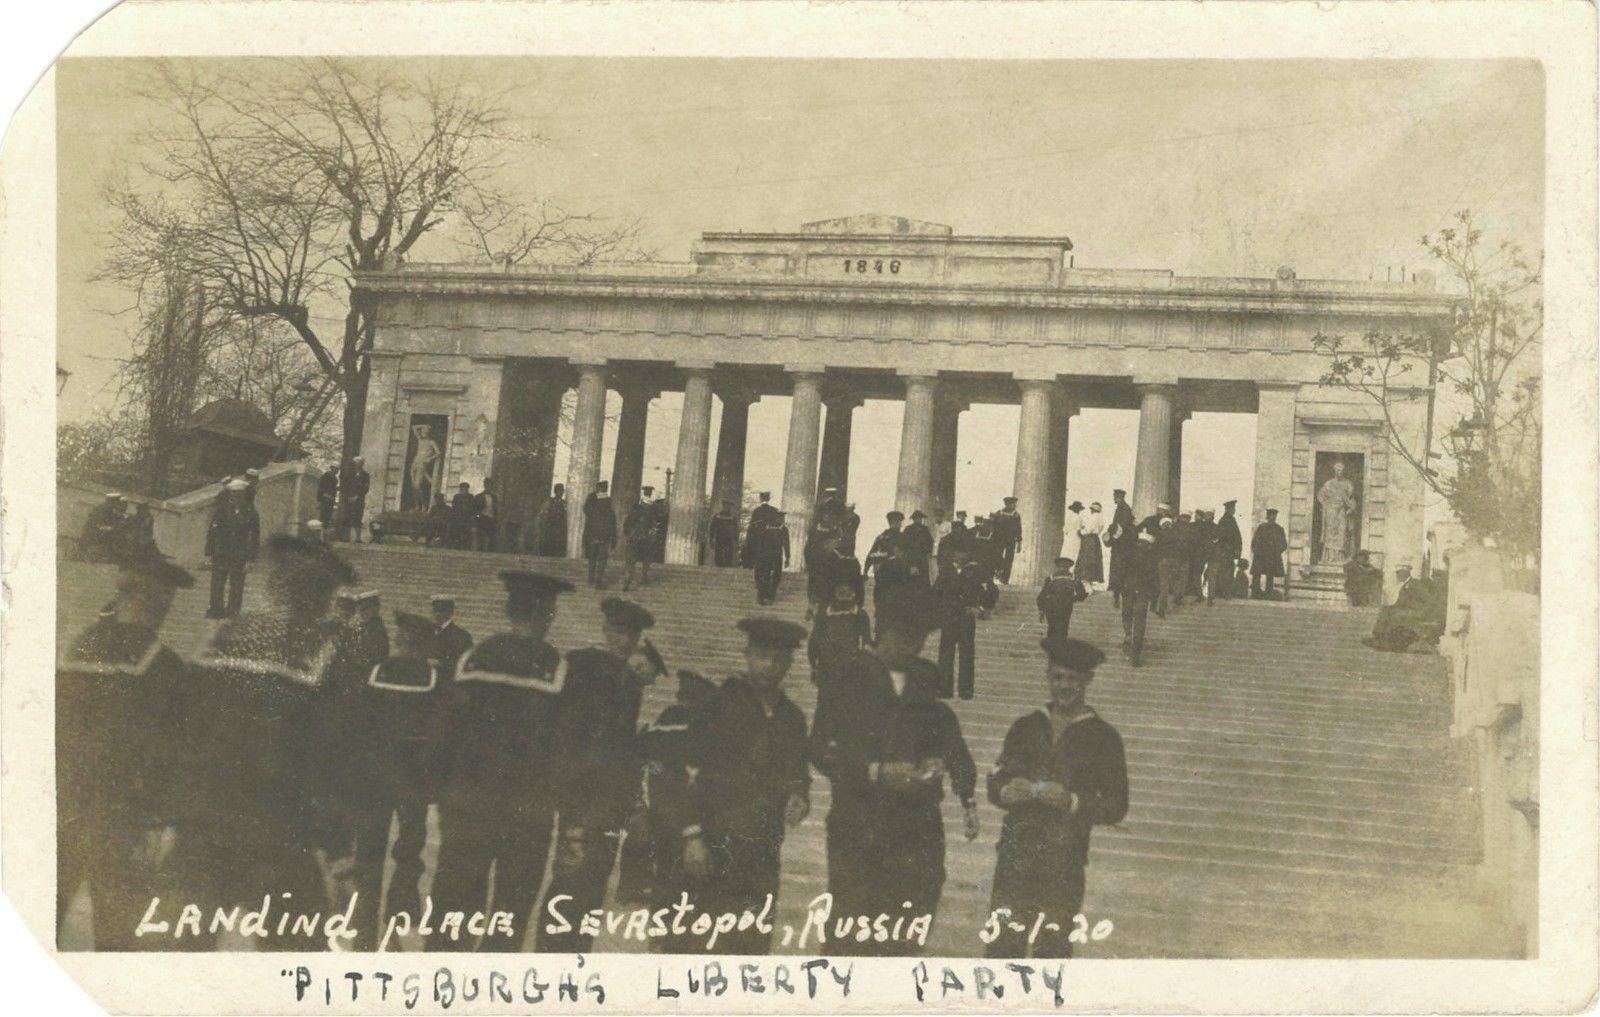 1920. Графская пристань